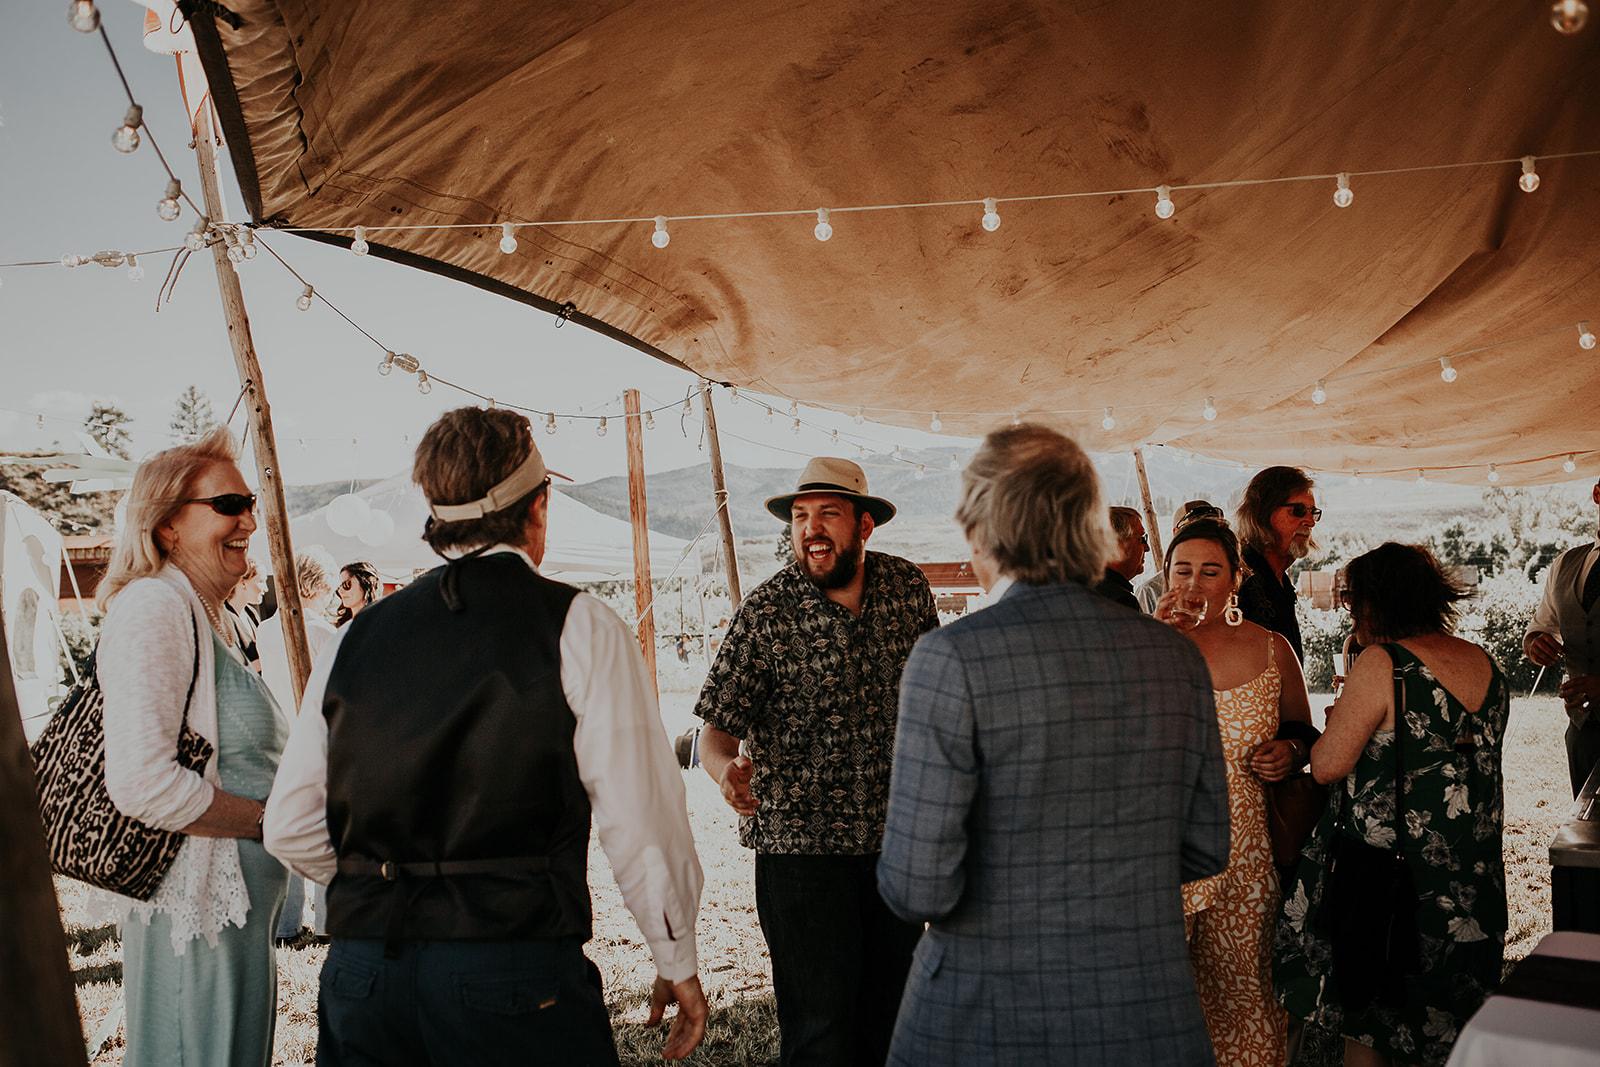 north-cascades-elopement-wedding-winthrop-wedding-photographer-megan-gallagher-photography (8).jpg